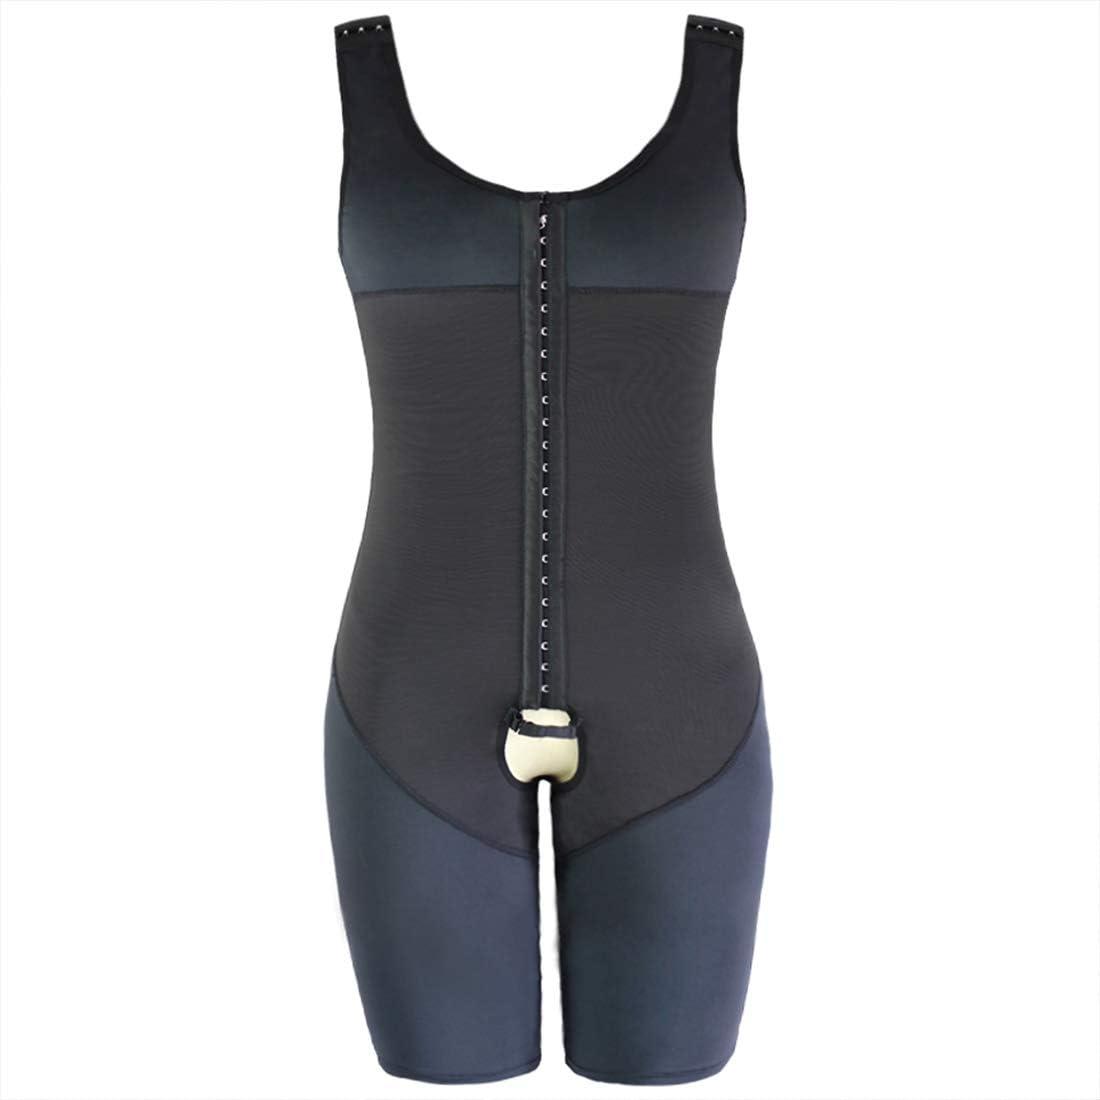 GWELL Mens Shapewear Figure Shaping Bodice Bodysuit Waist Shaper Underwear Shaping Bodysuit with Hook Front Knee Length Large Size